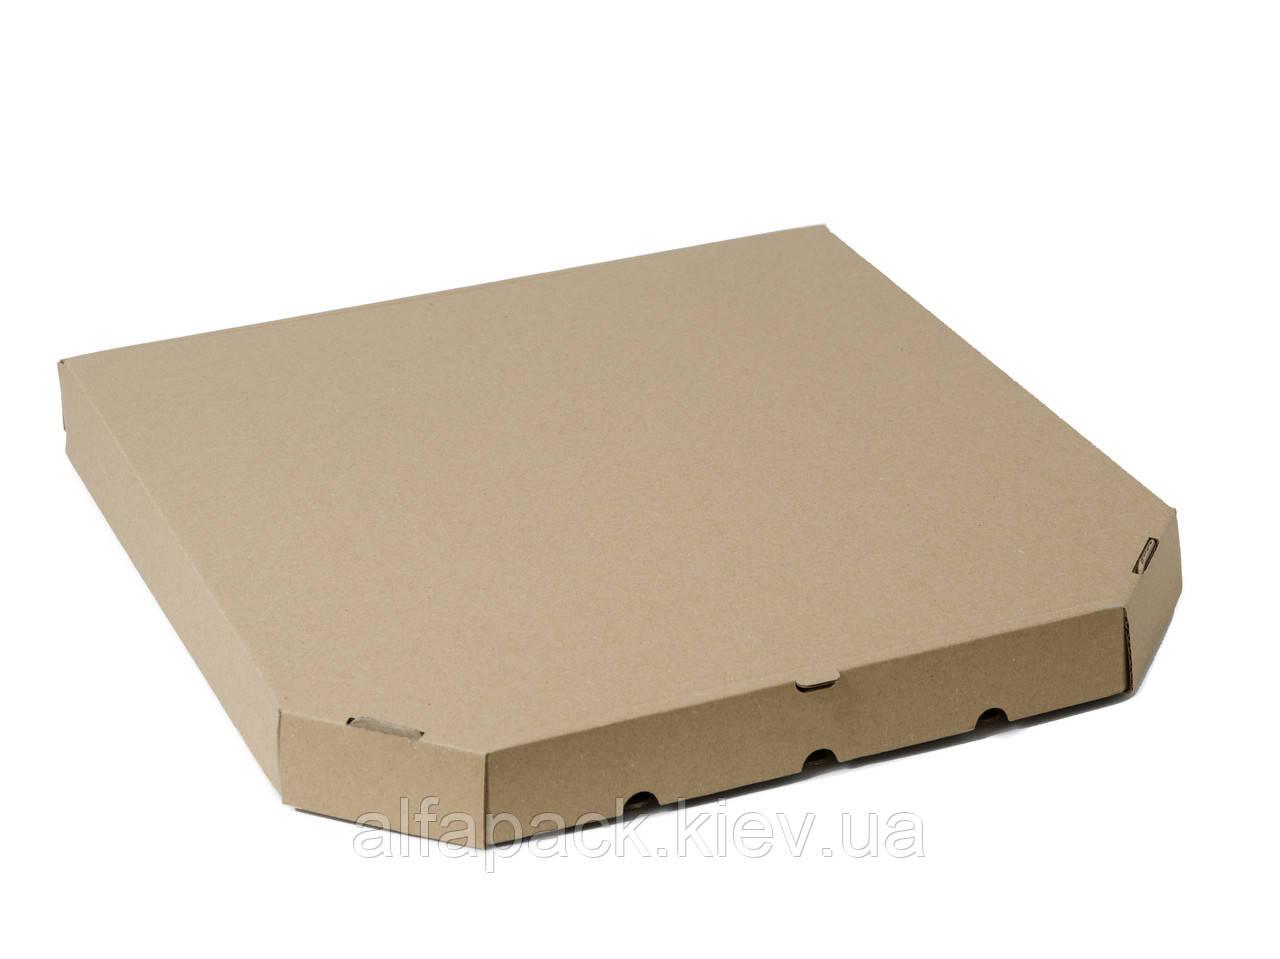 Коробка для пиццы бурая D-35, 350х350х37 мм